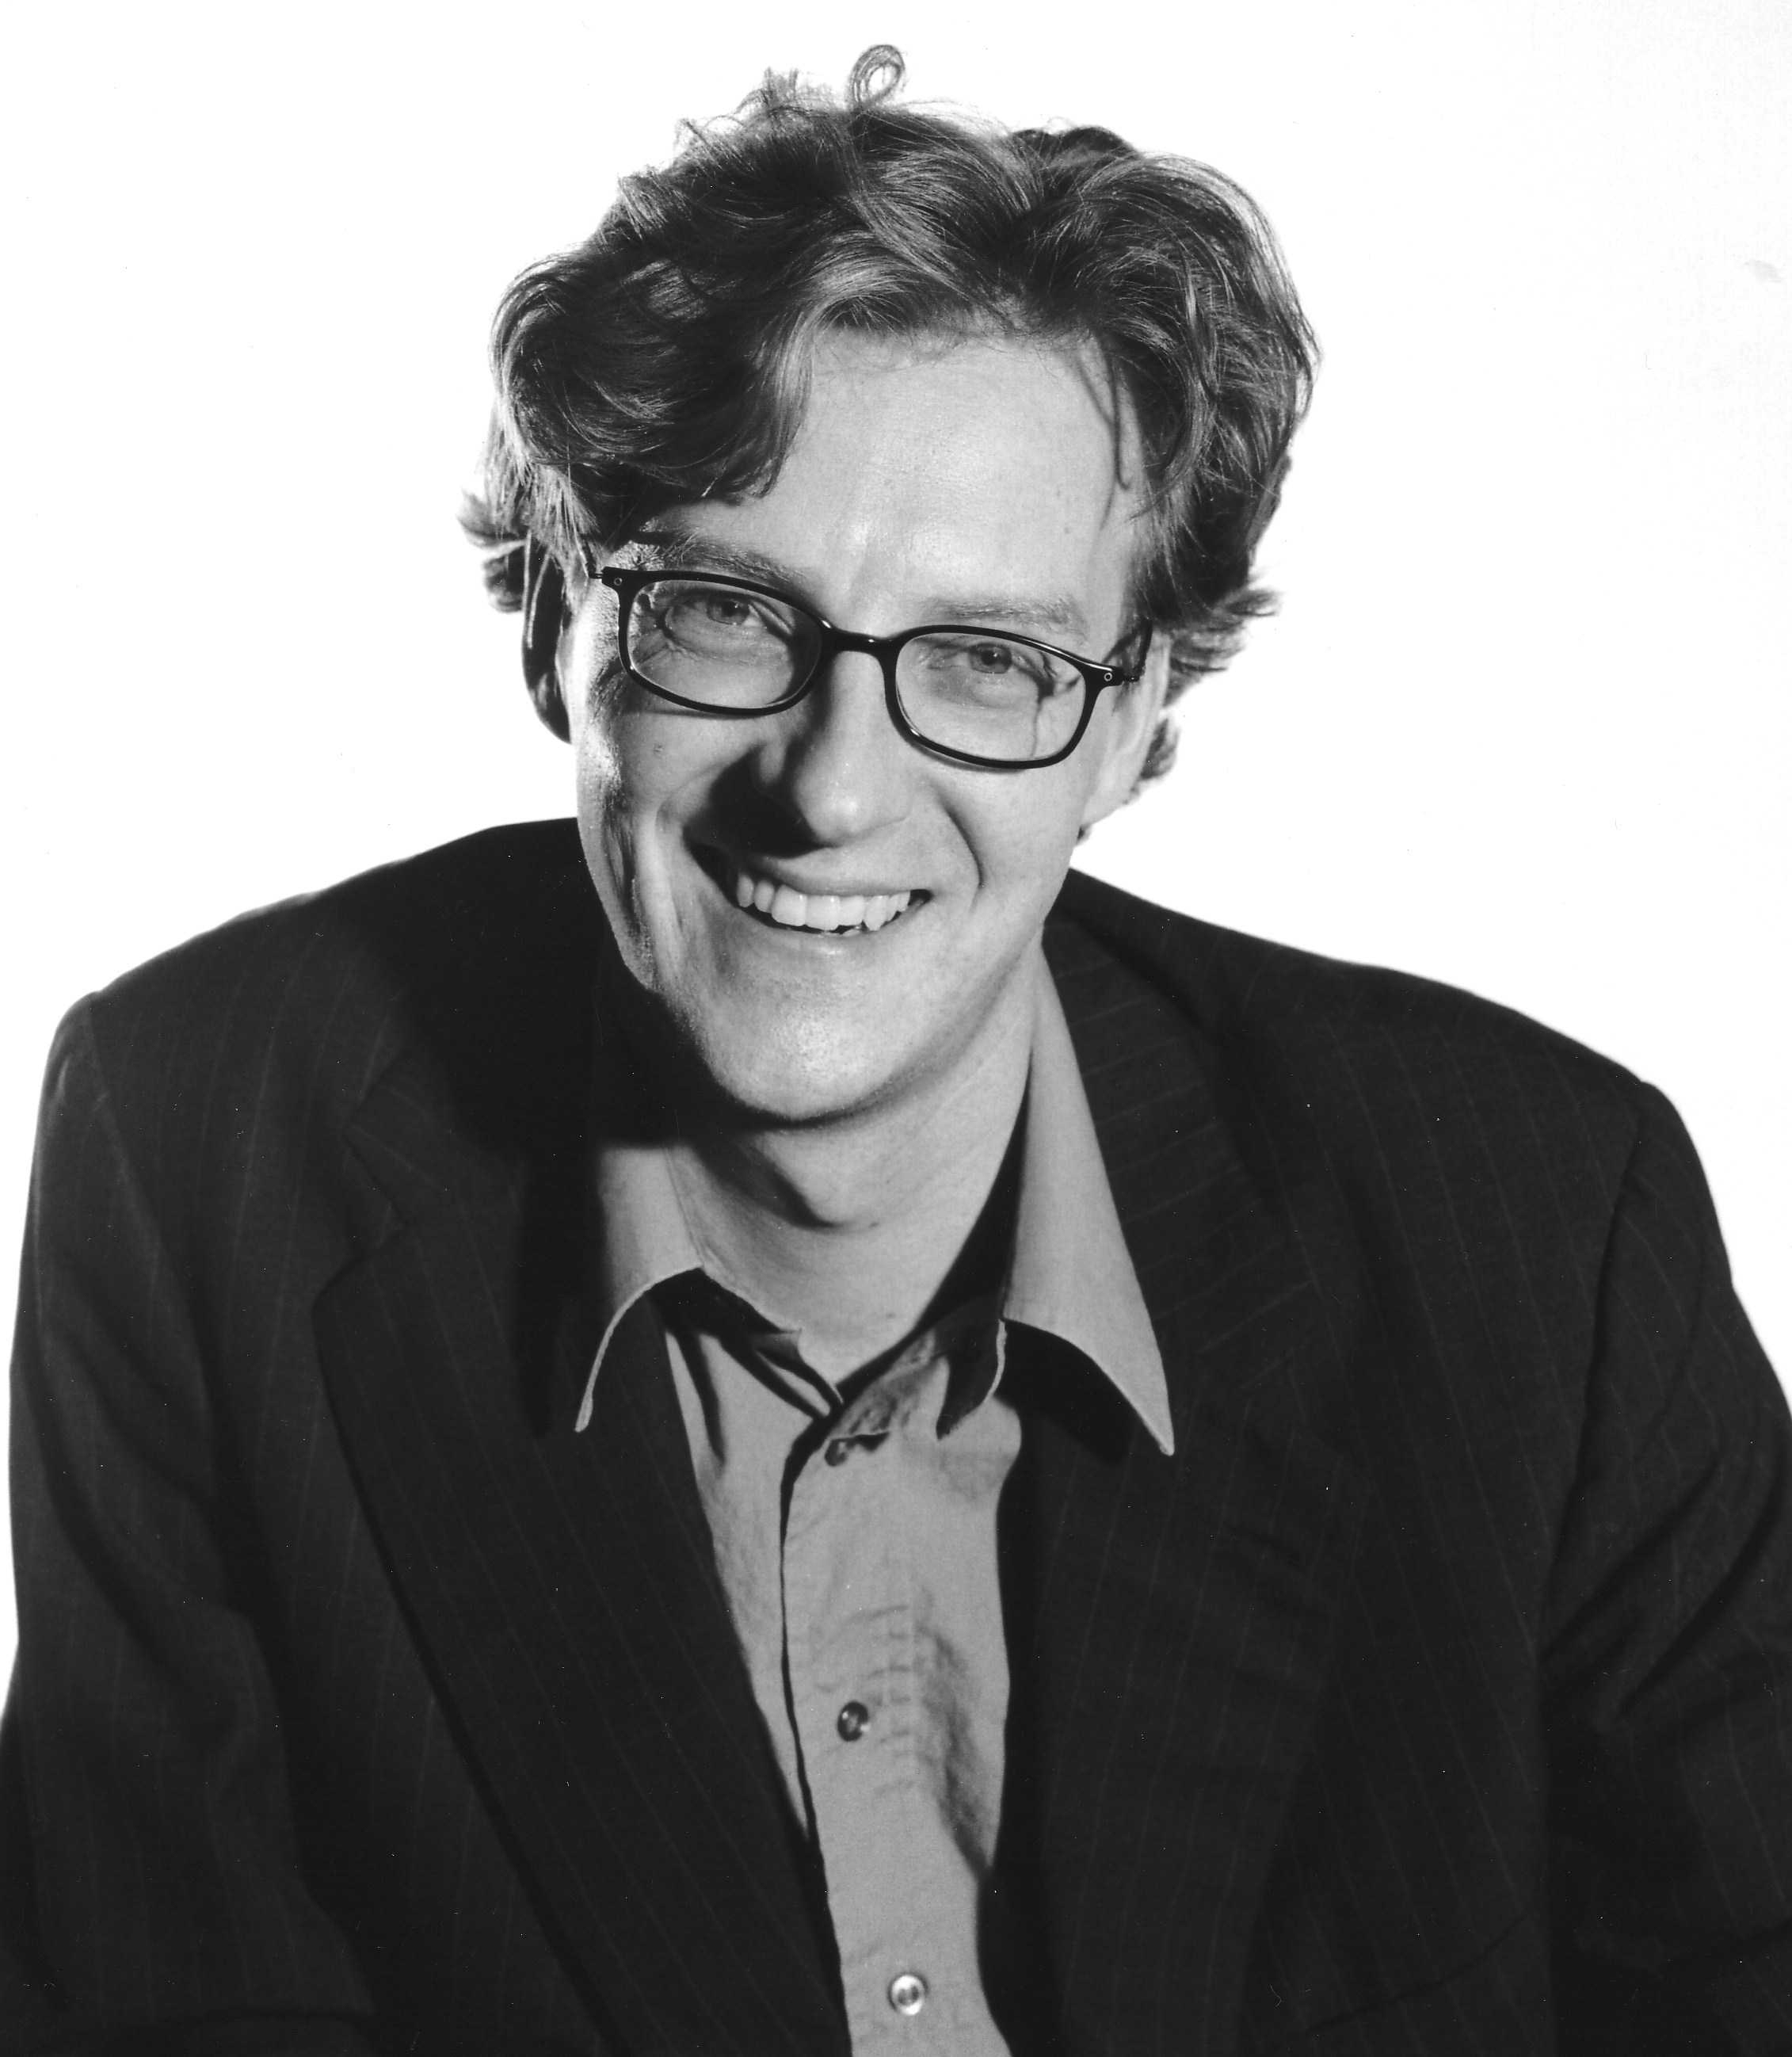 - John Davie –Saturday Morning Cartoon Host